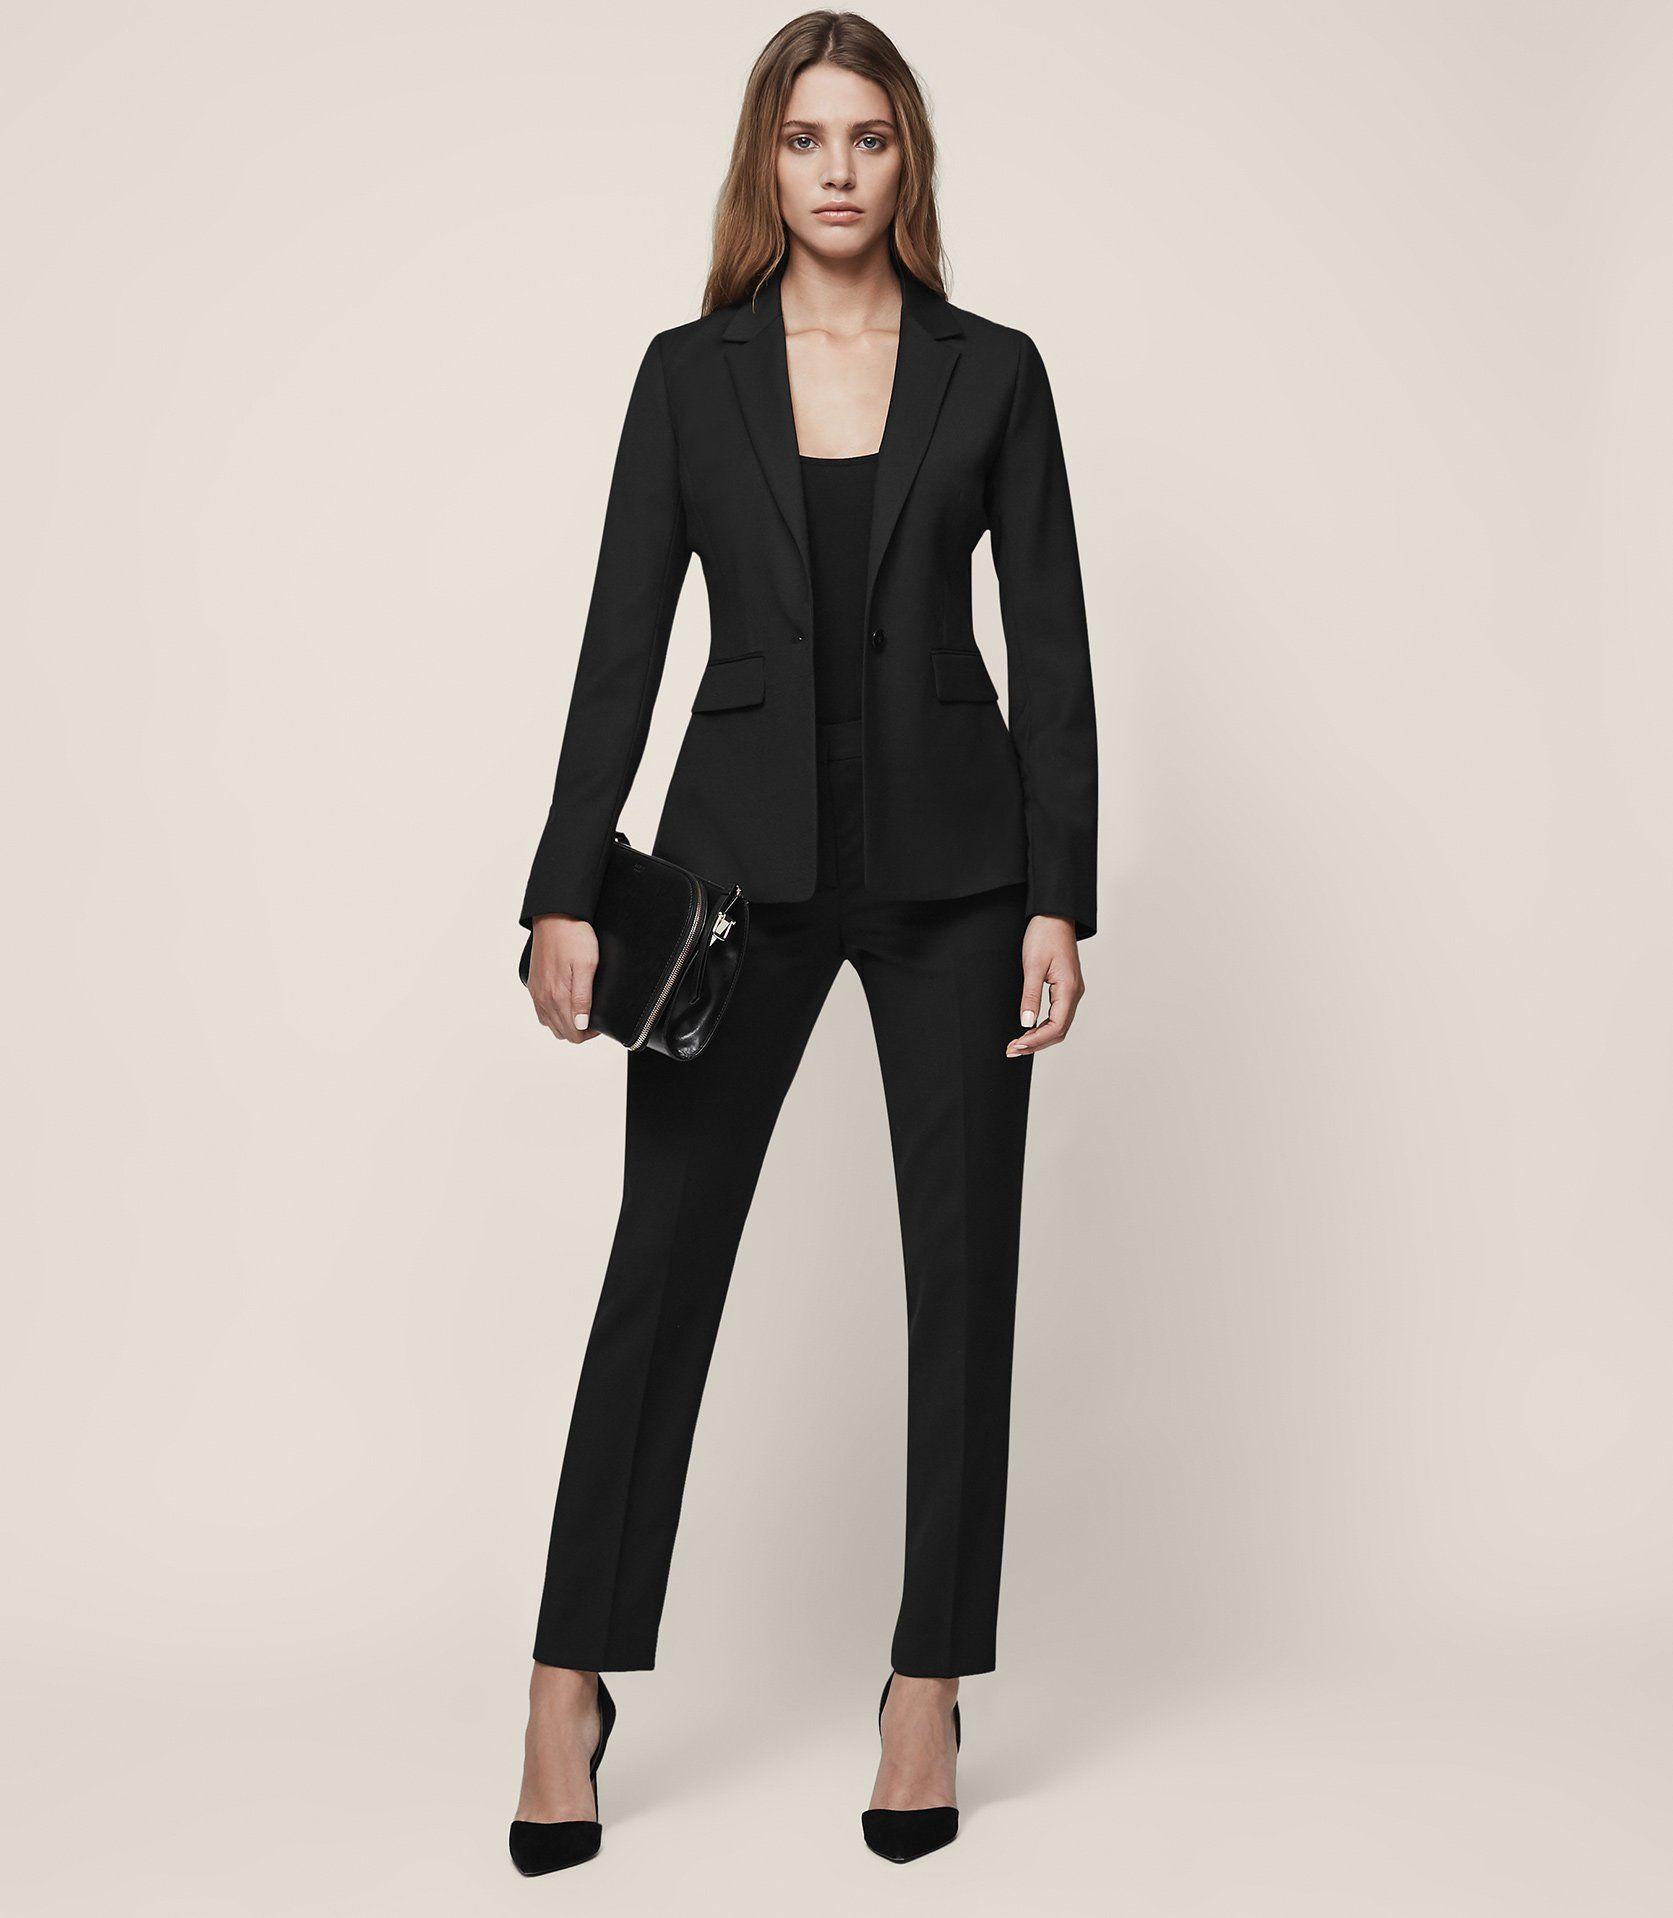 73222be1103 Huxley Jacket Single-Breasted Blazer - REISS Office Style